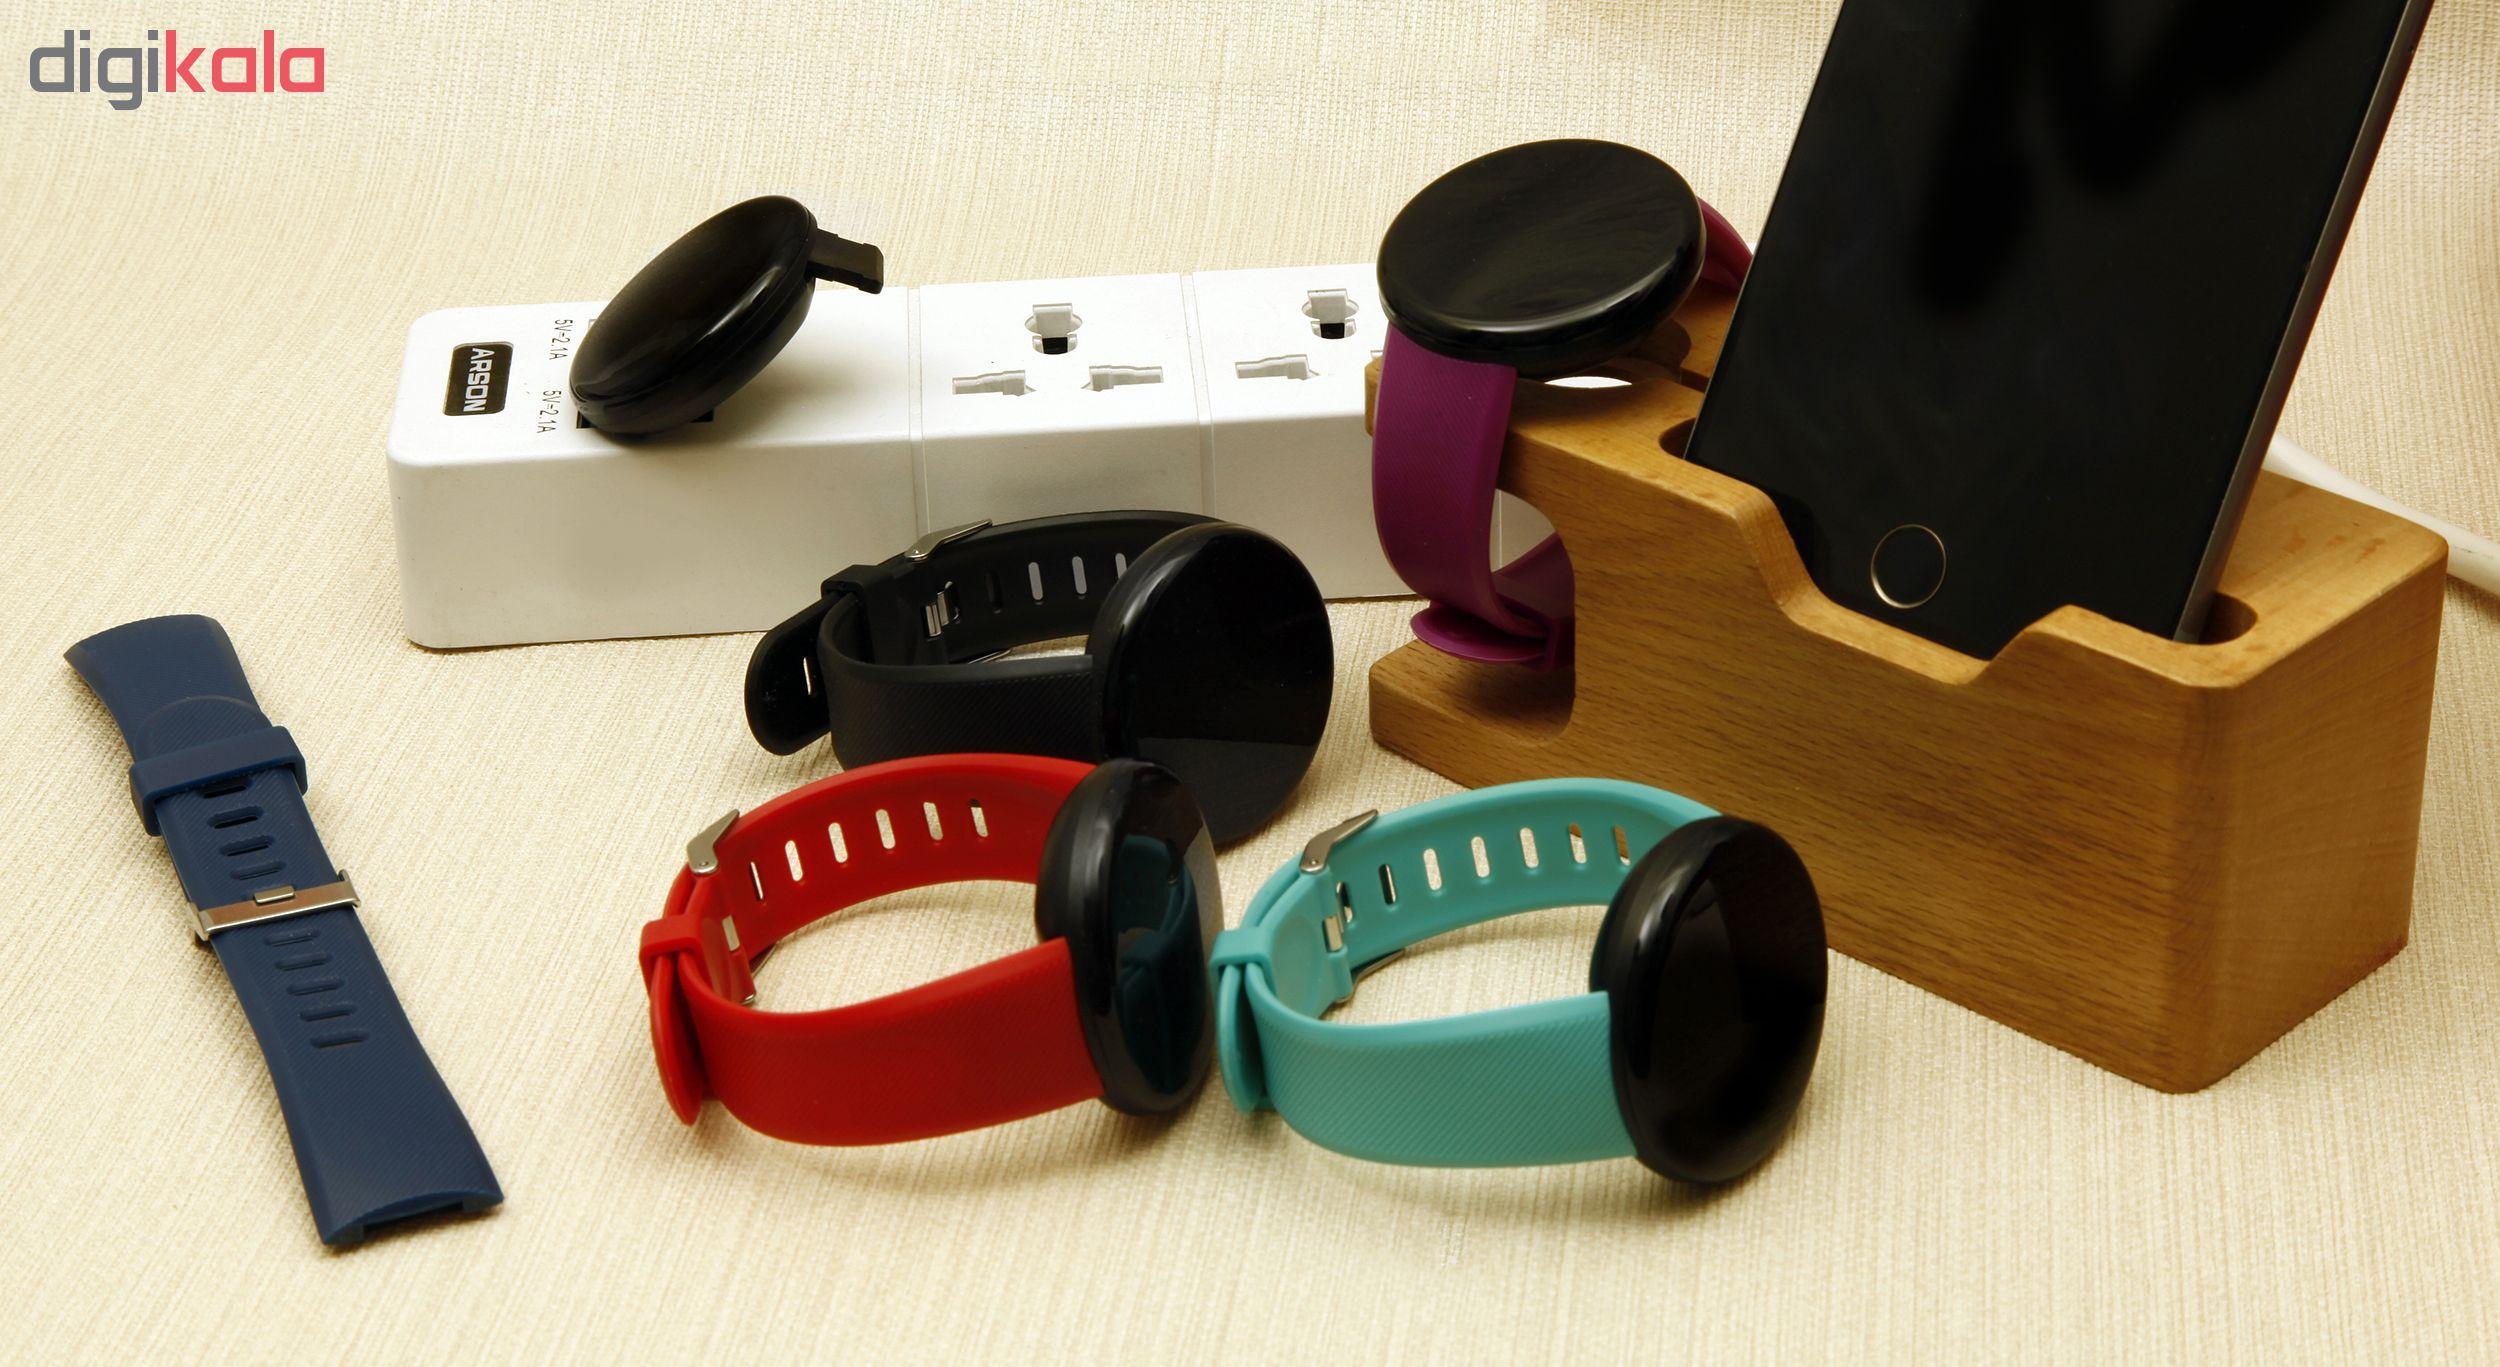 ساعت هوشمند مدل Bakeey D18 main 1 17